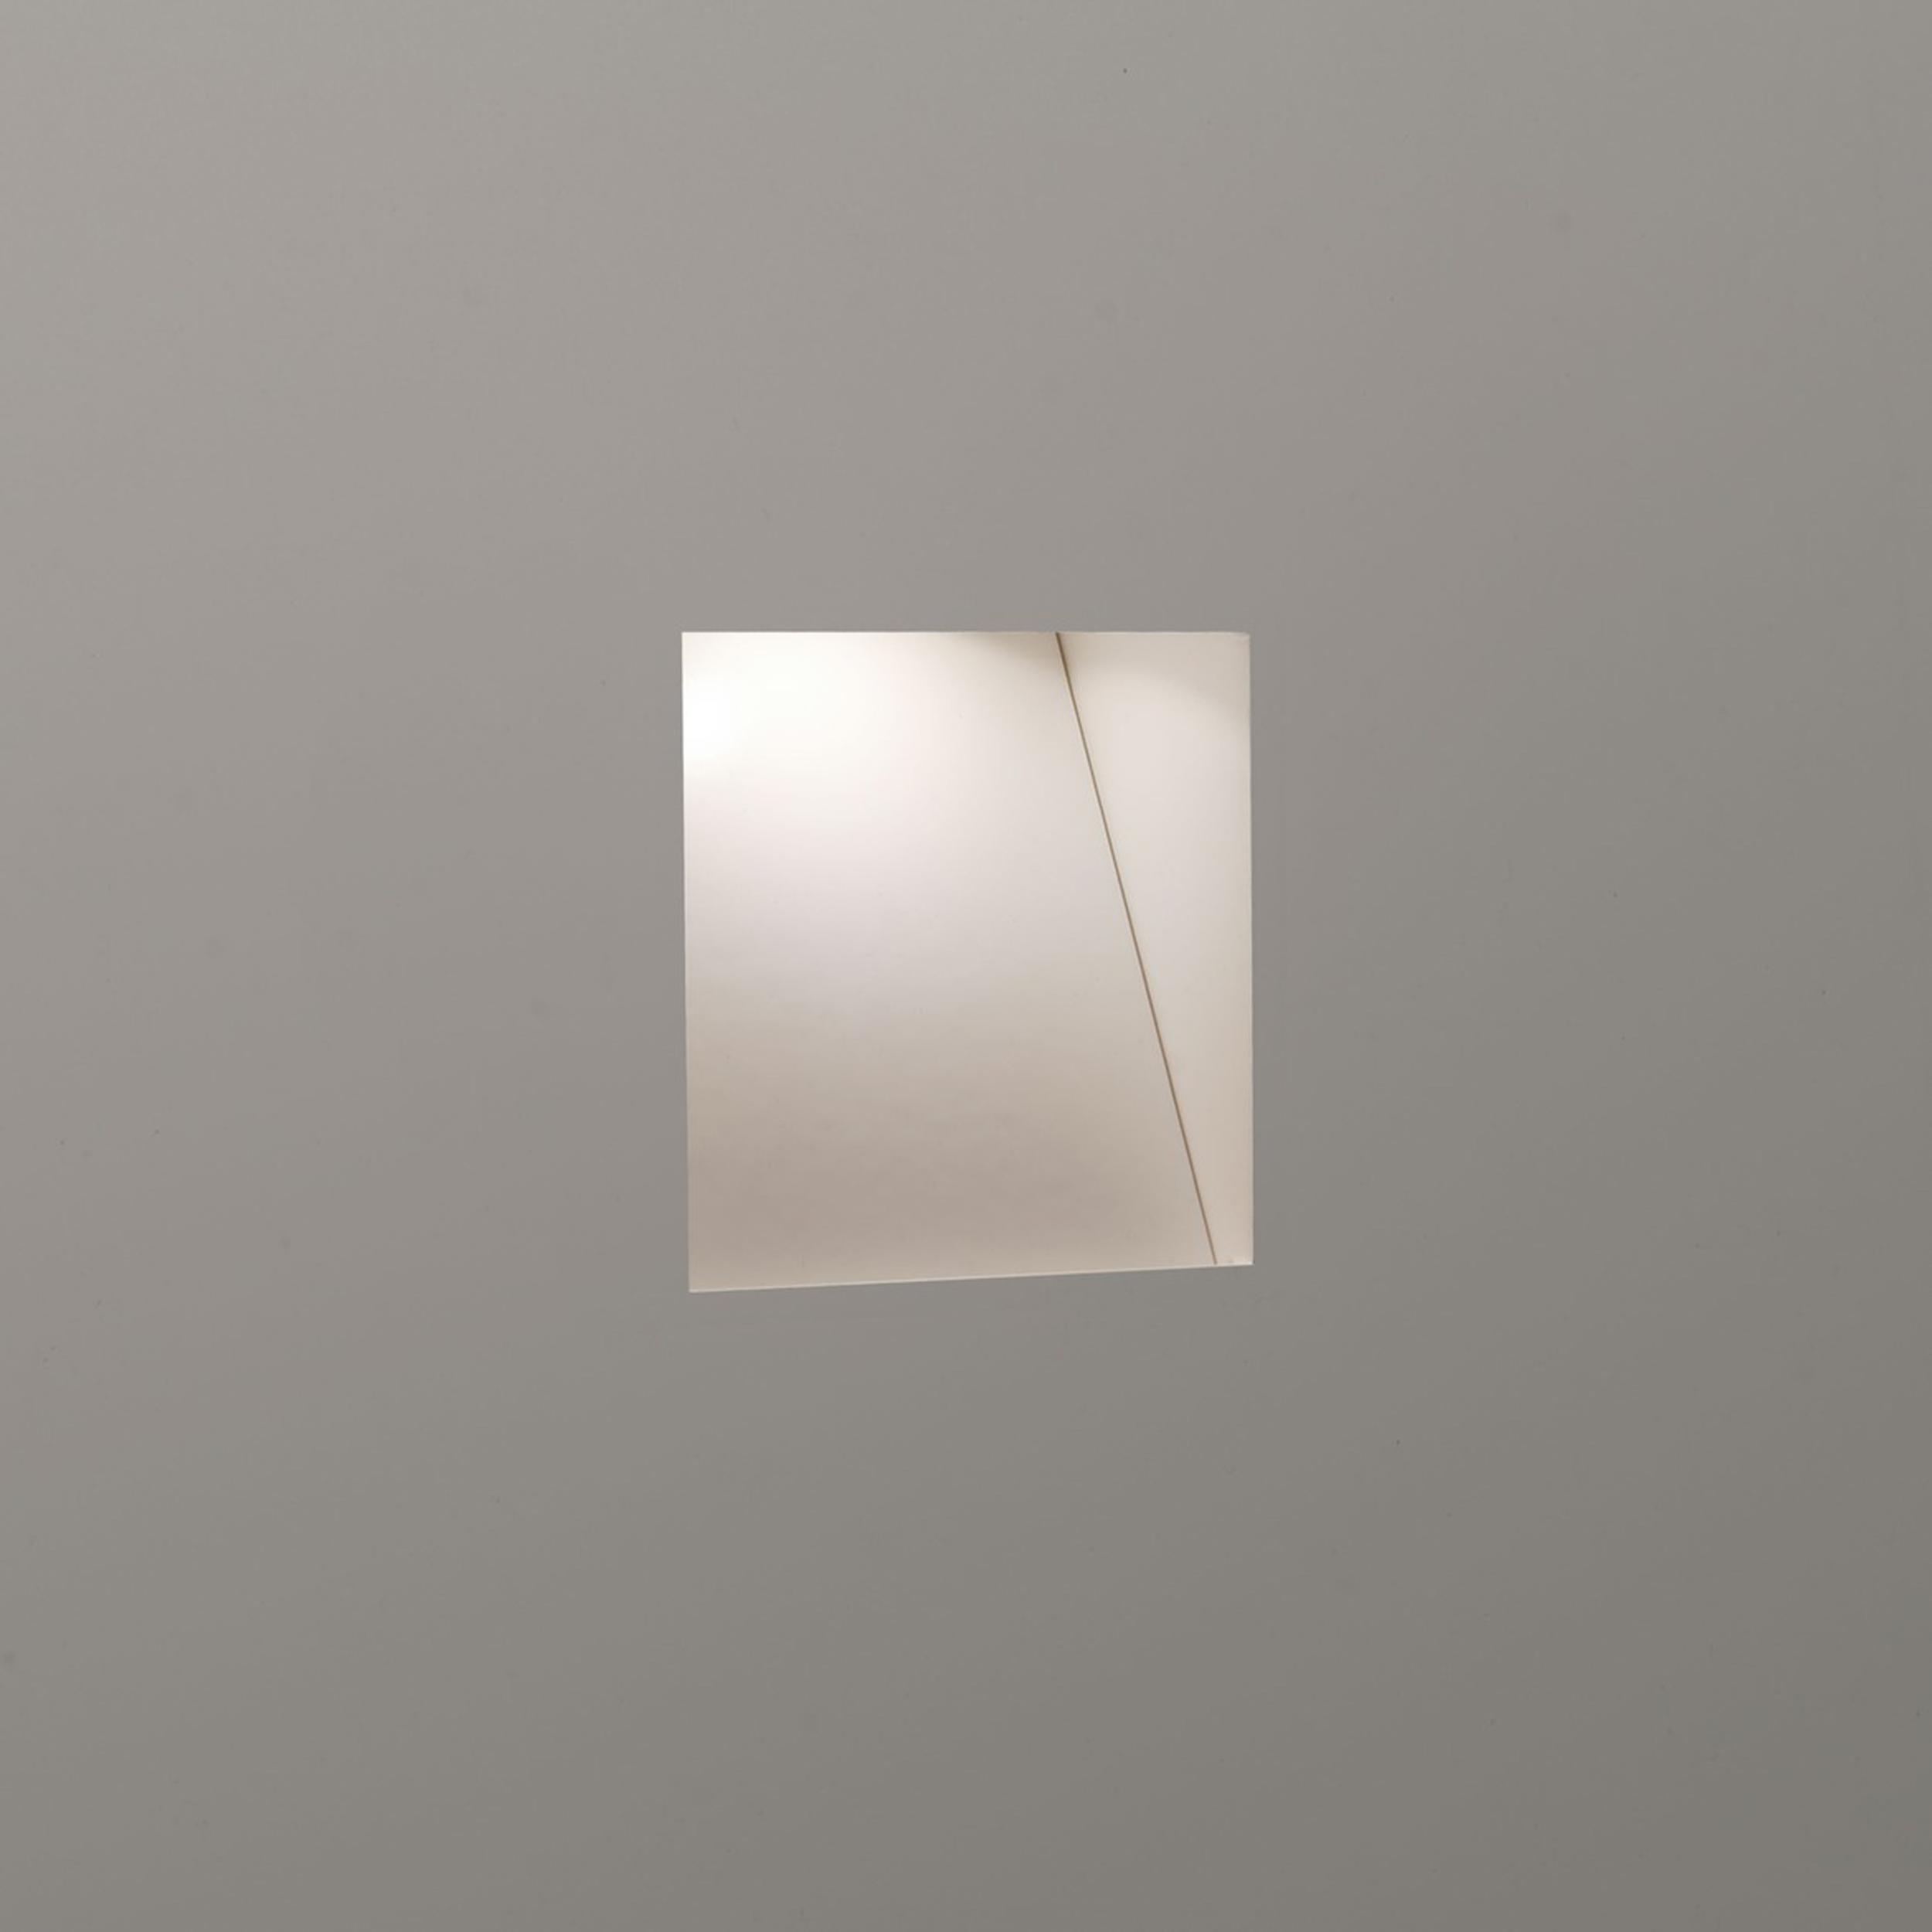 Astro Borgo Trimless Mini Wall Light 2700k